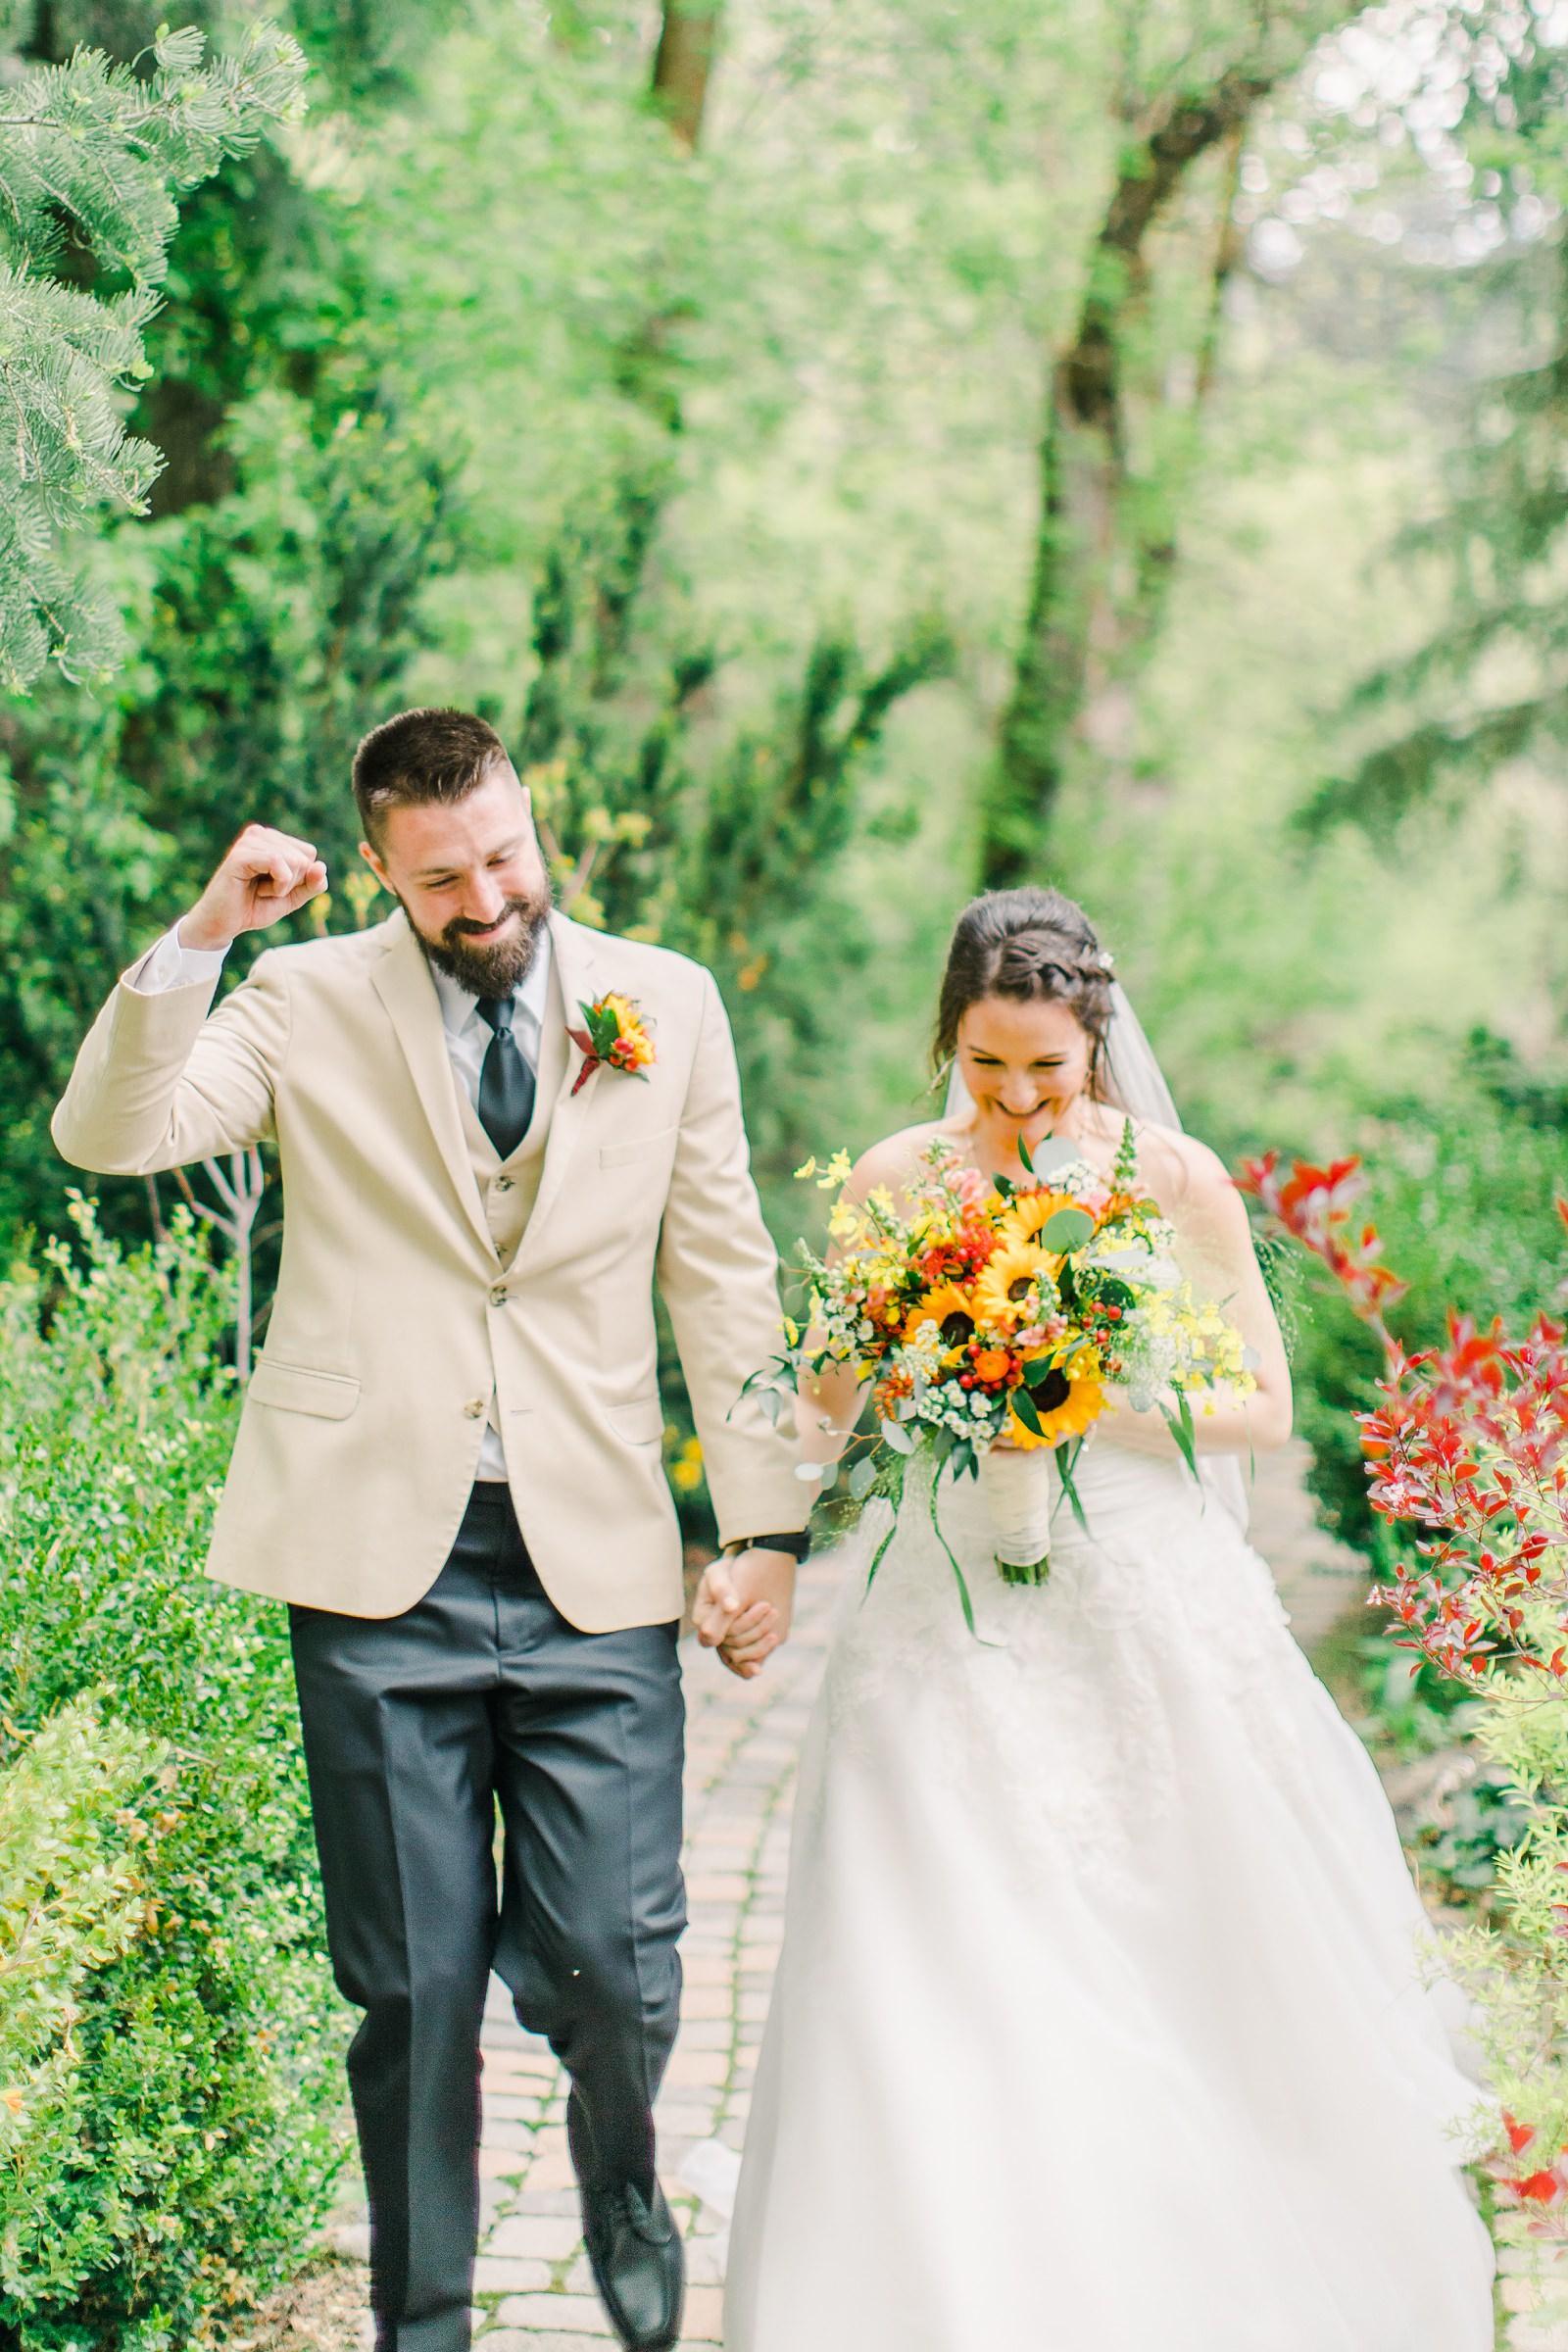 Millcreek Inn Summer Wedding, Utah wedding photography Millcreek Canyon, Salt Lake City, bride and groom